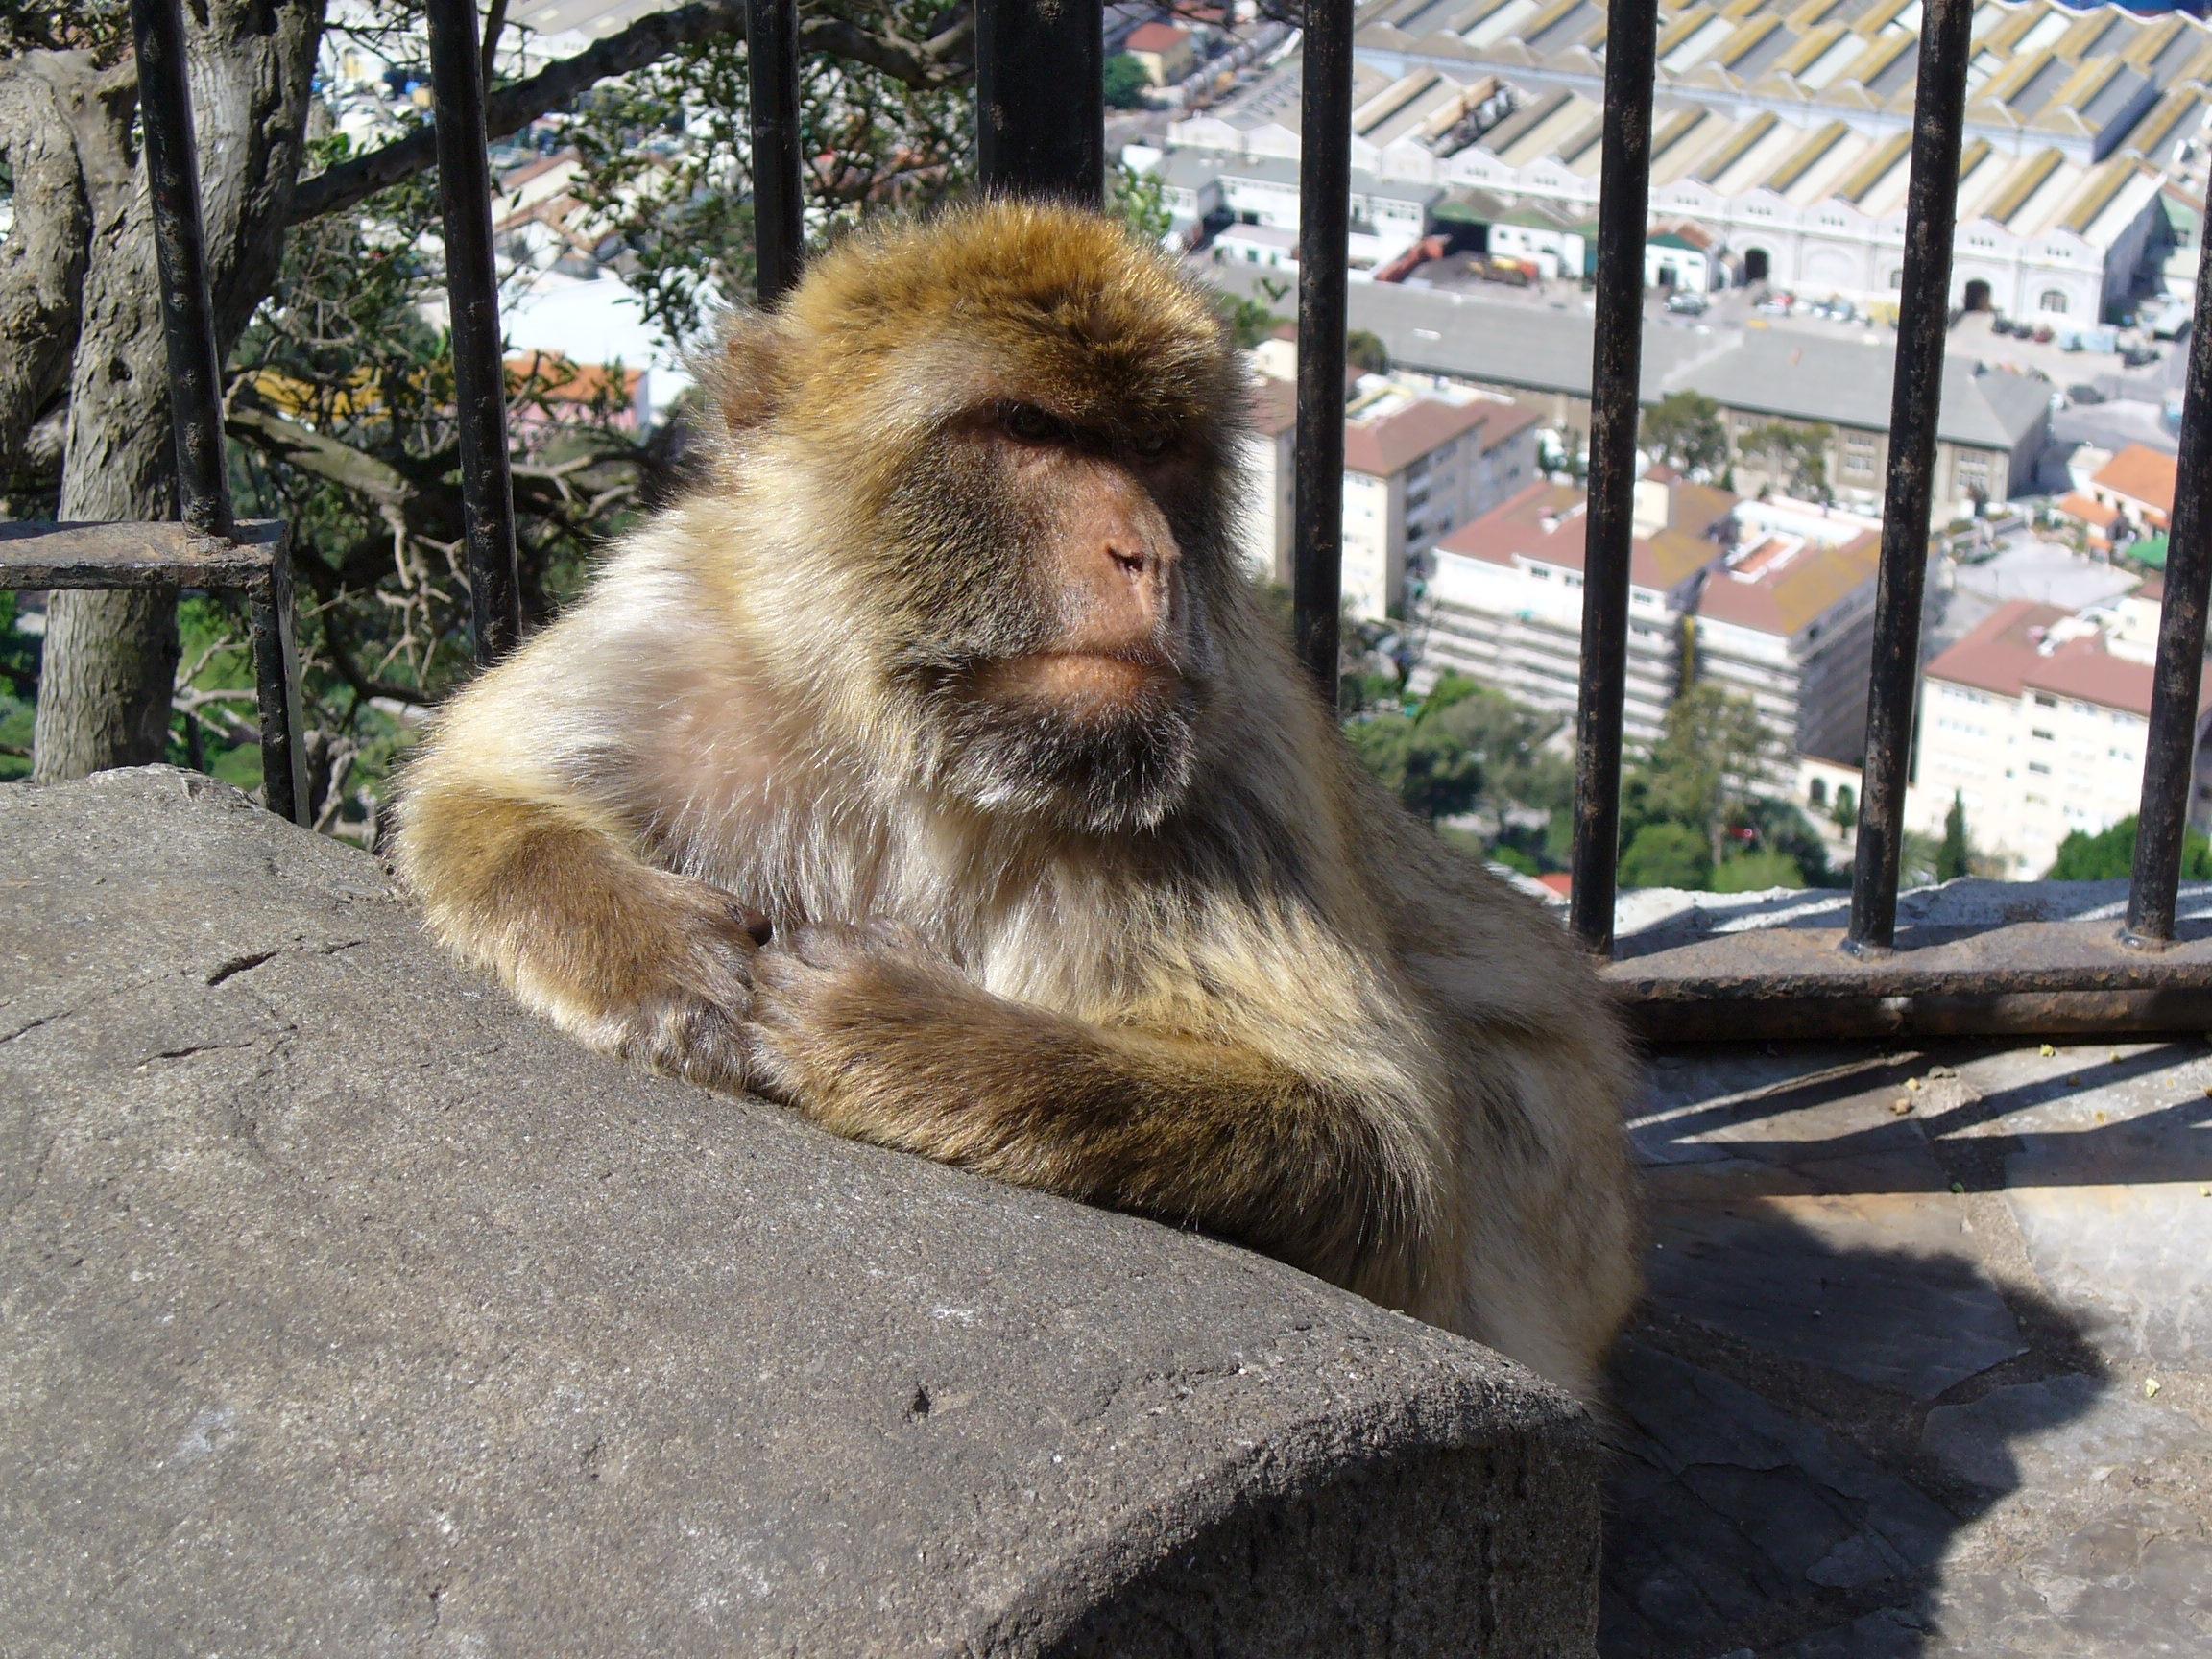 Free Images : animal, zoo, mammal, fauna, primate, gibraltar, spain